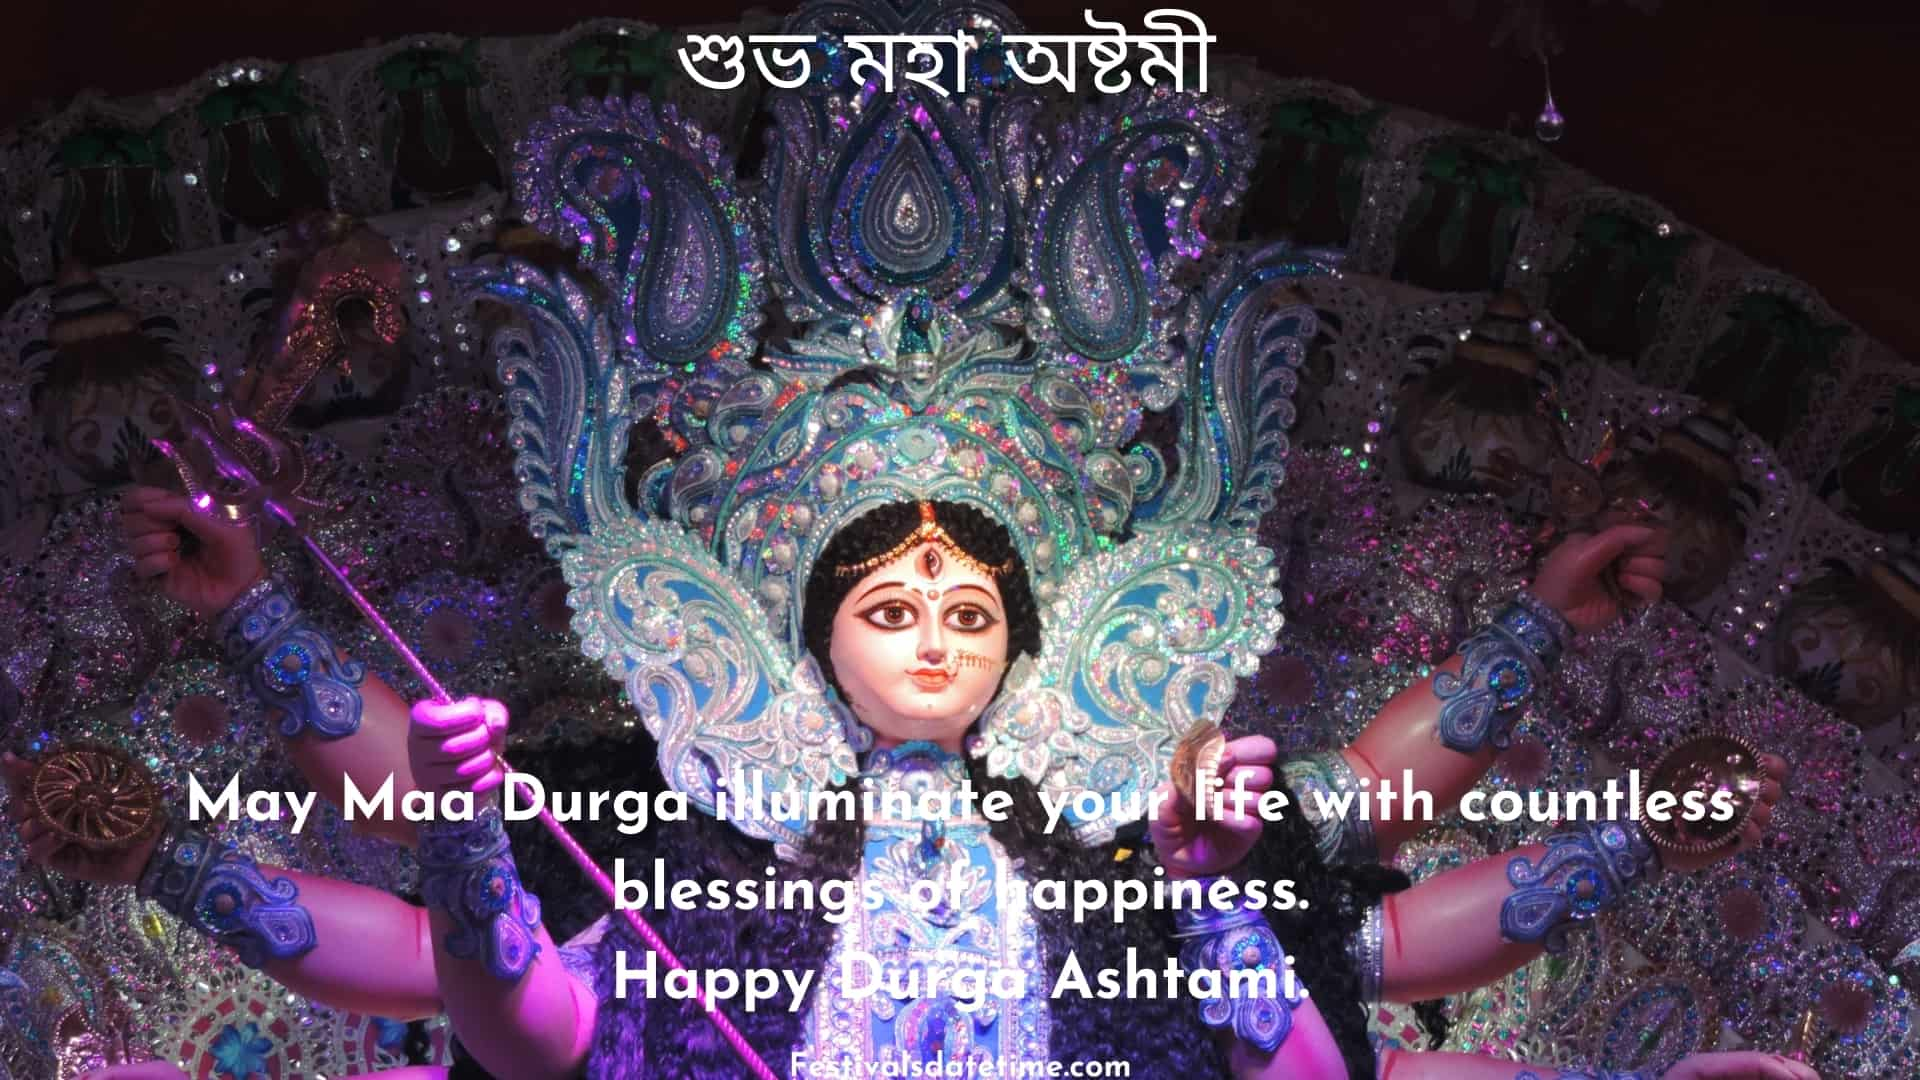 durga_ashtami_wishes_images